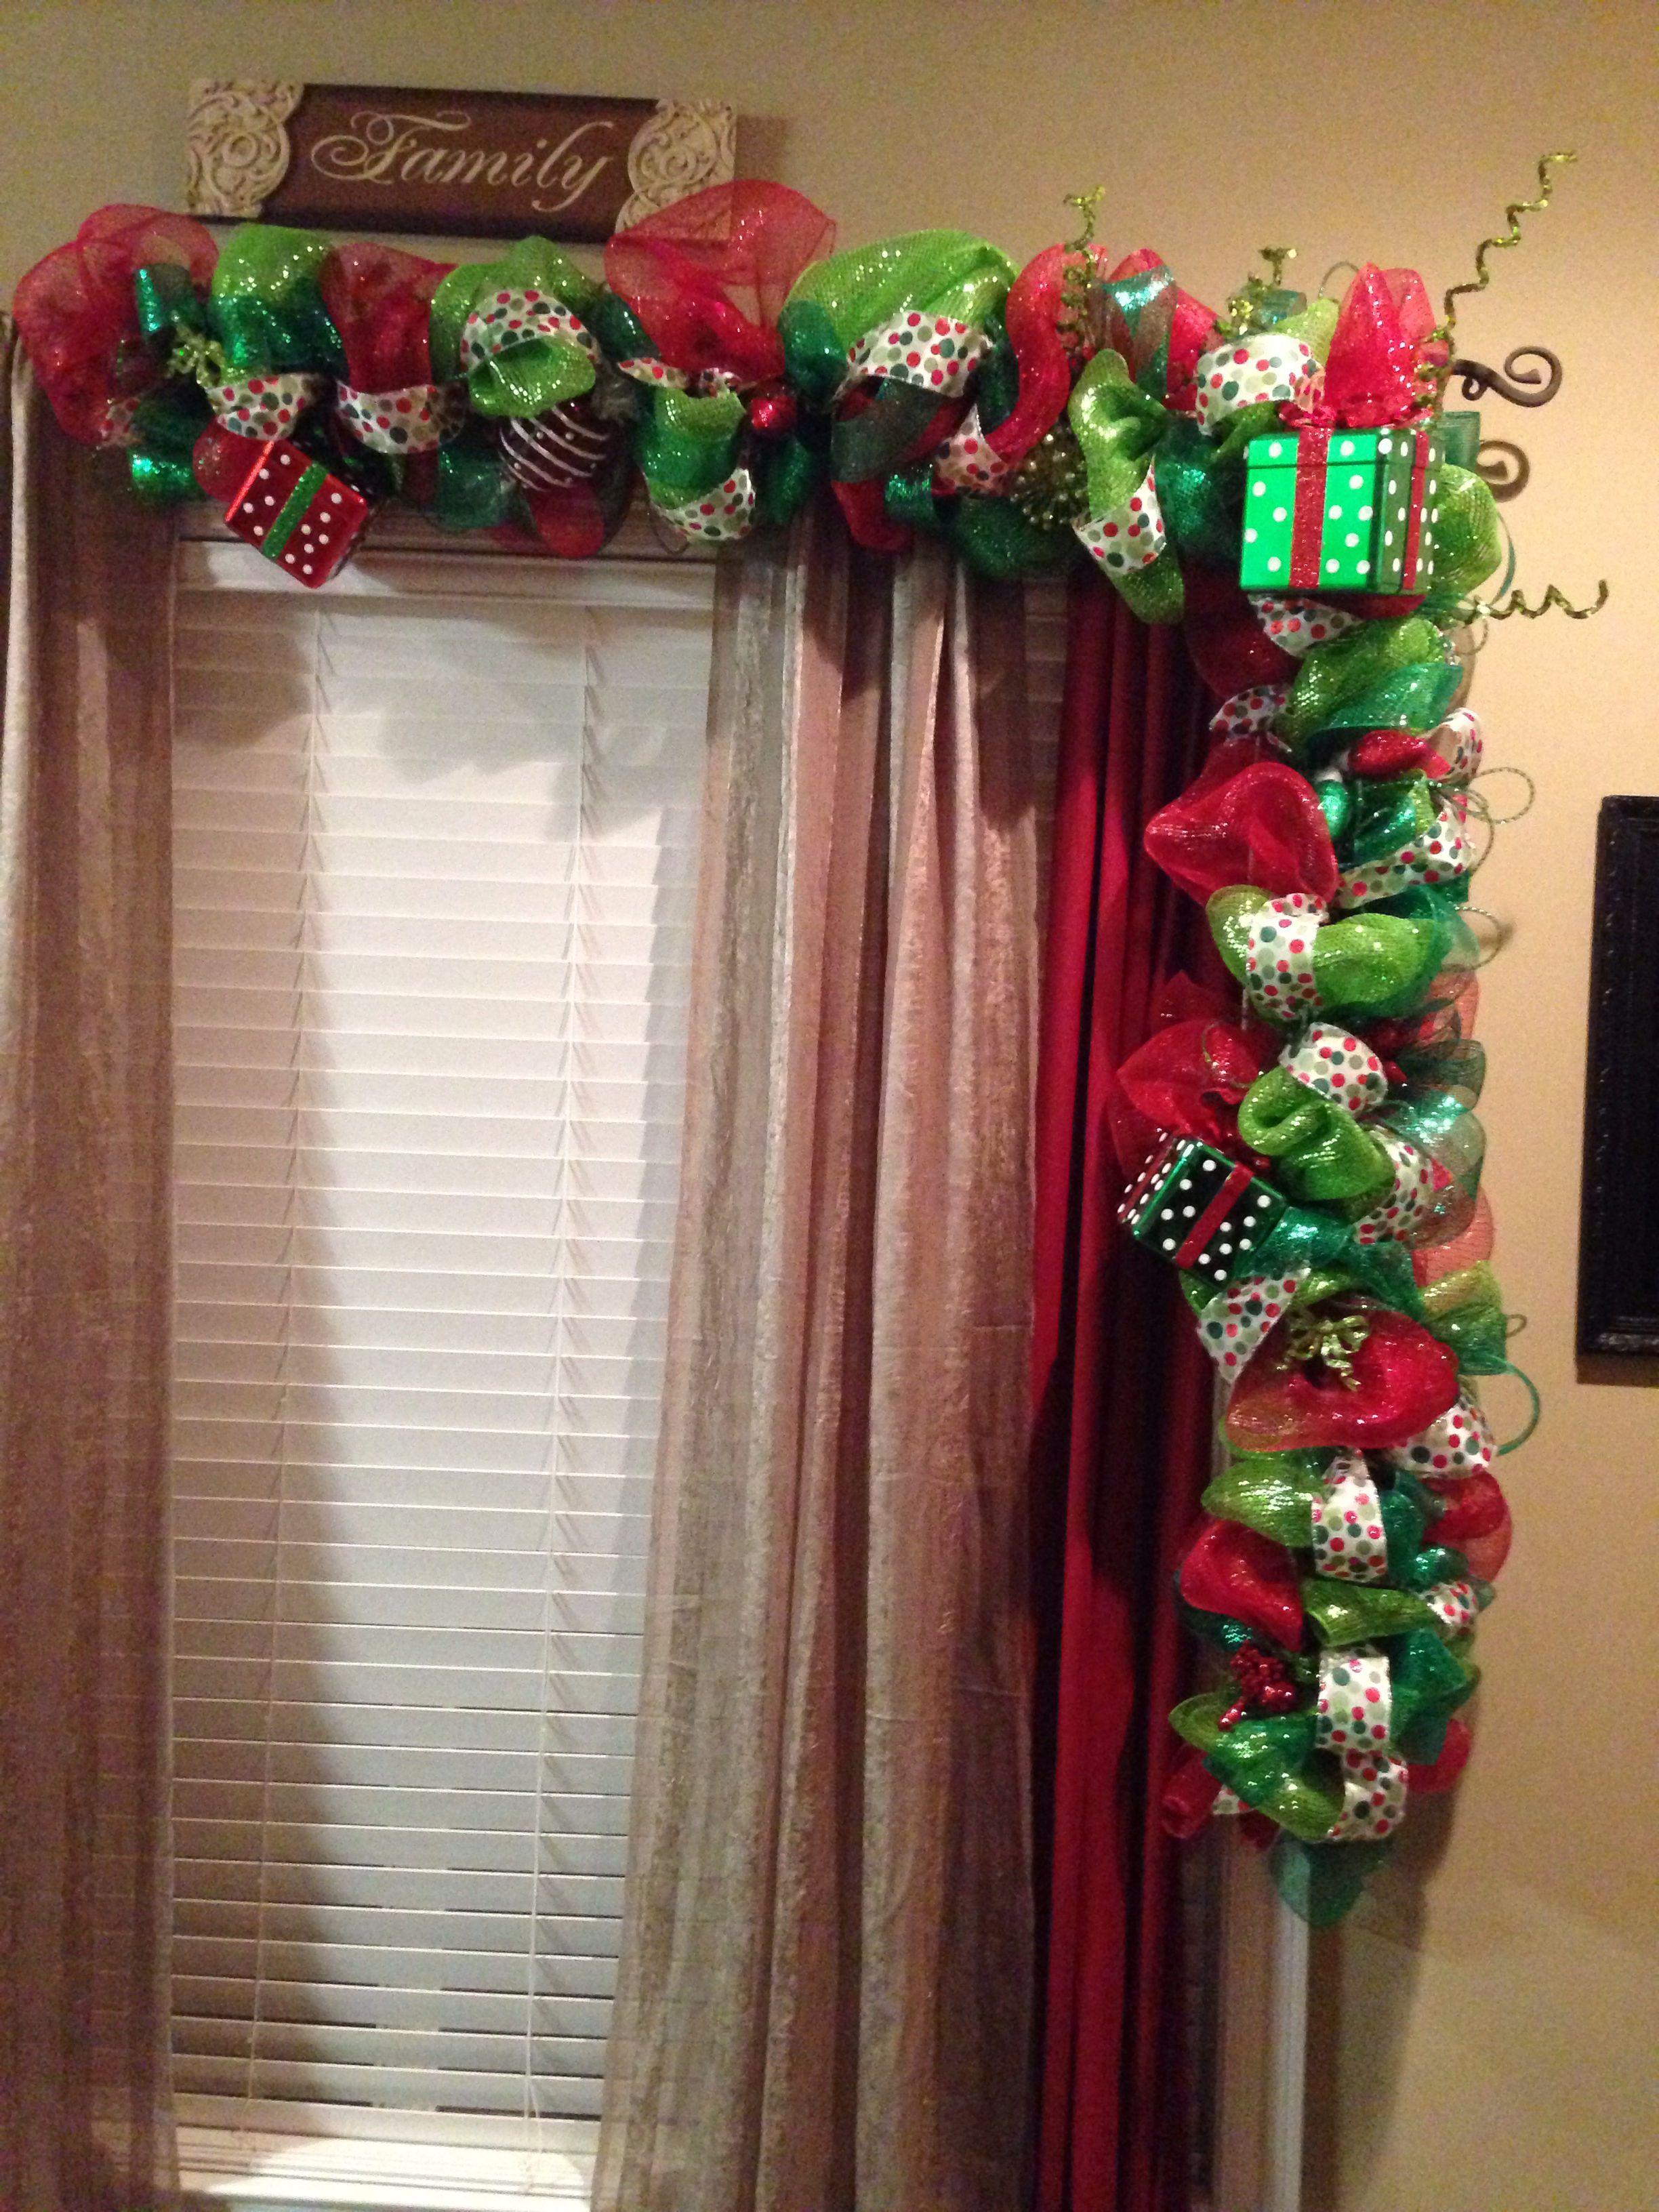 My christmas decor 2013 i made this pinterest - Adornos navidenos para oficina ...